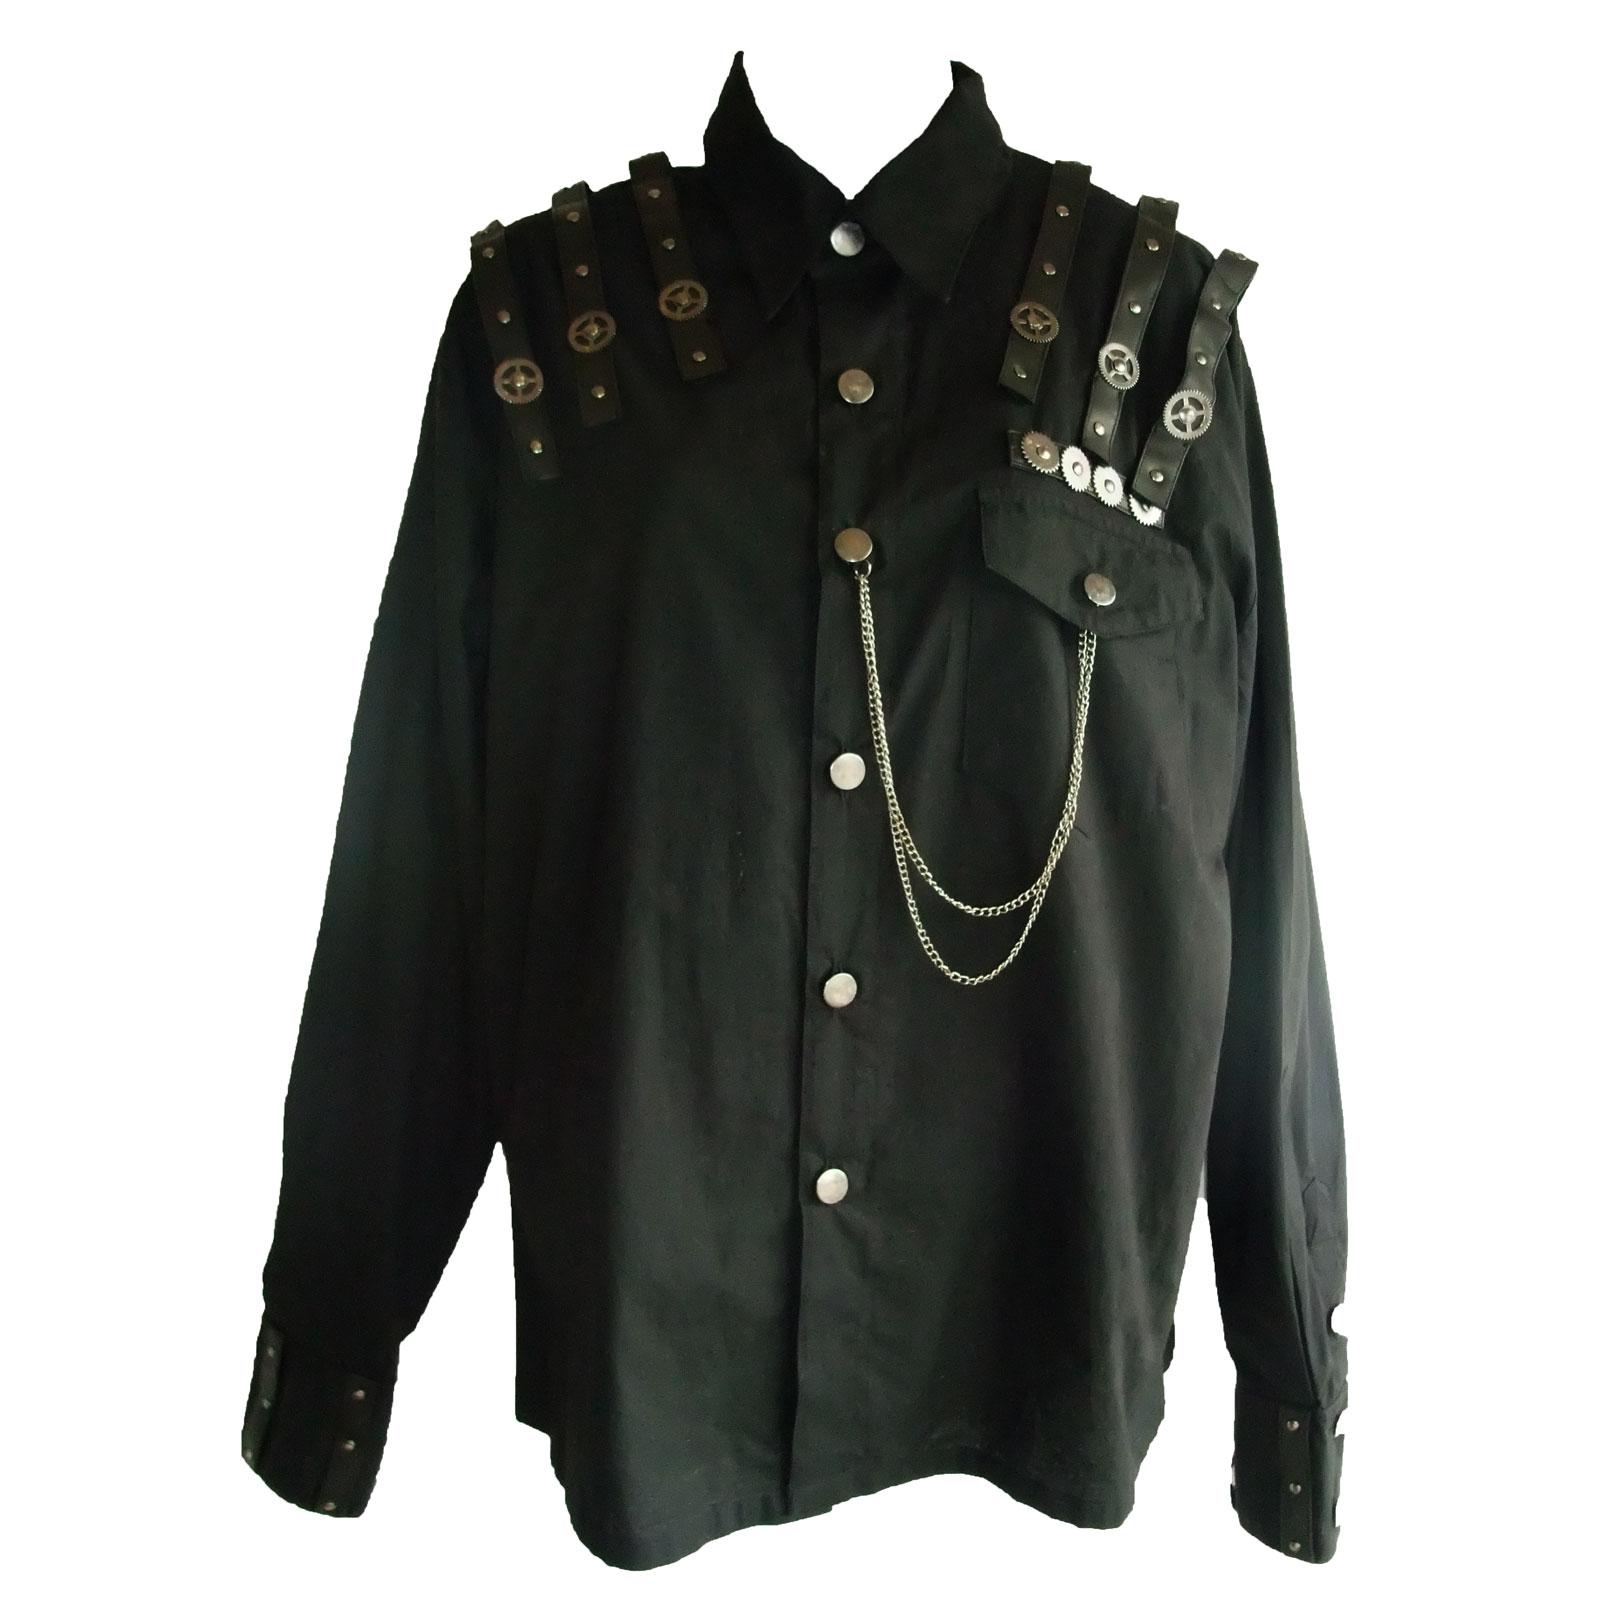 Gms 39 Steampunk Gothic Shirt By Quot Sdl Quot With Black Faux